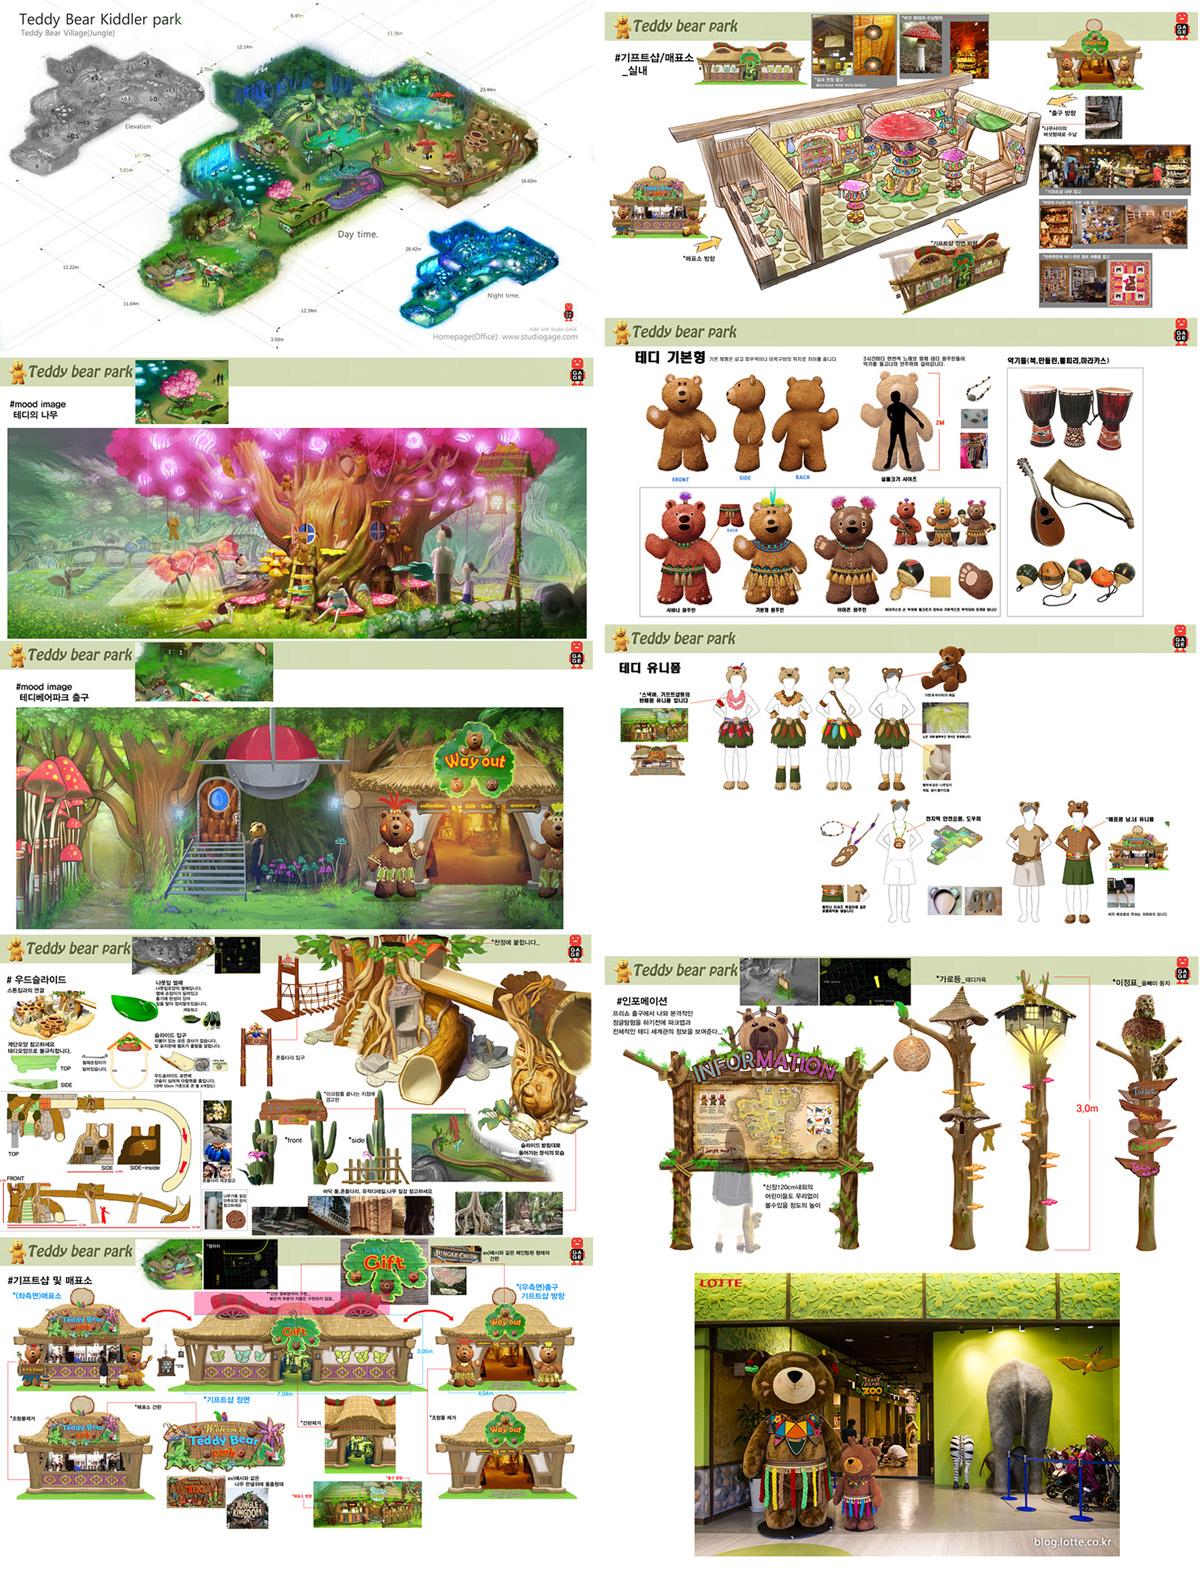 KiddlerPark_map_re 2ssss